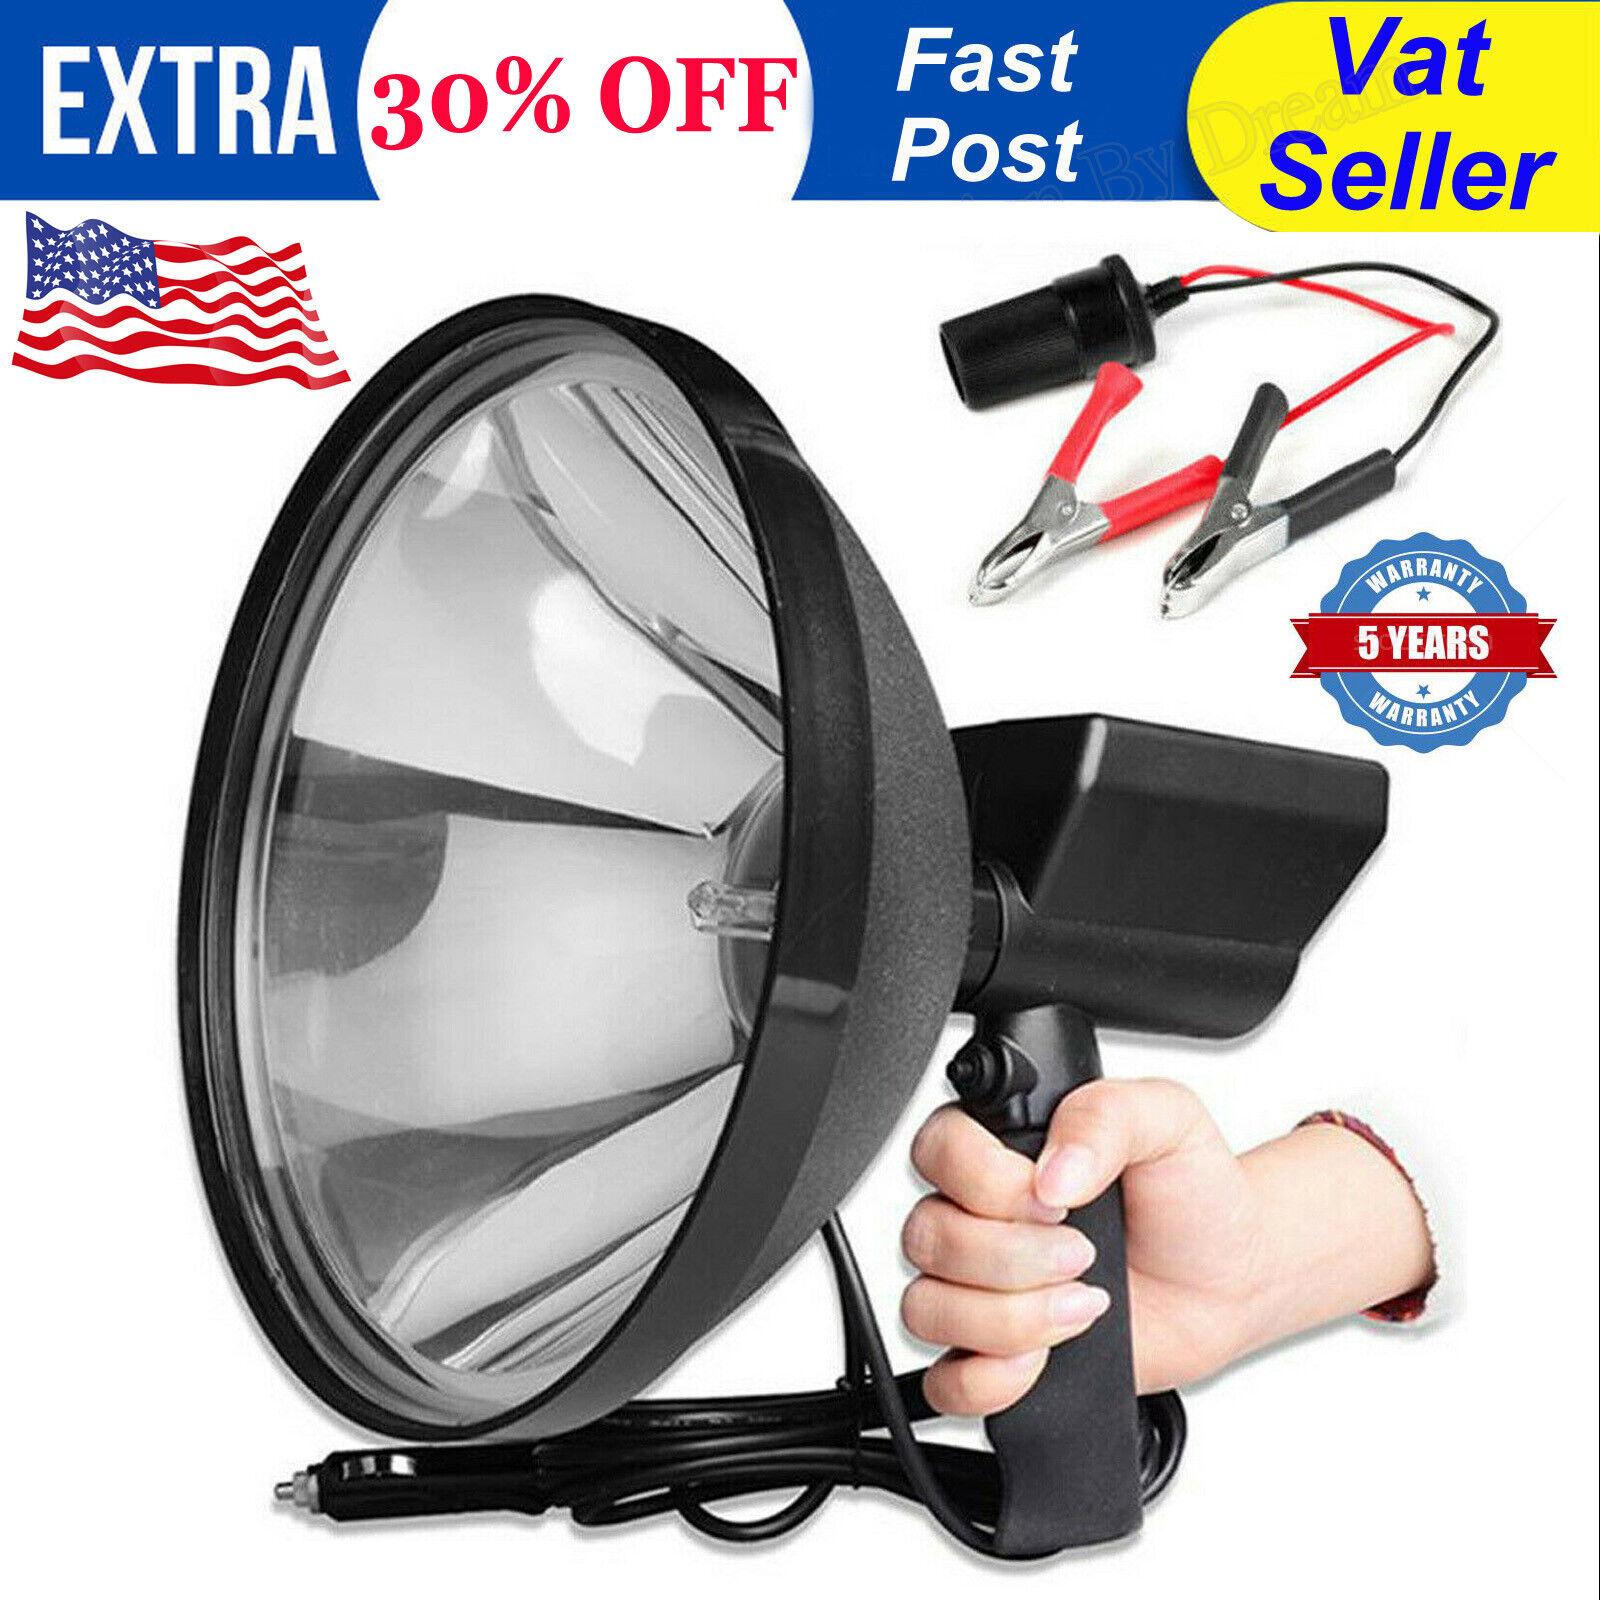 9 600W 60000LM HID Handheld Lamp Camping Hunting Fishing  Super Bright Spot light  designer online